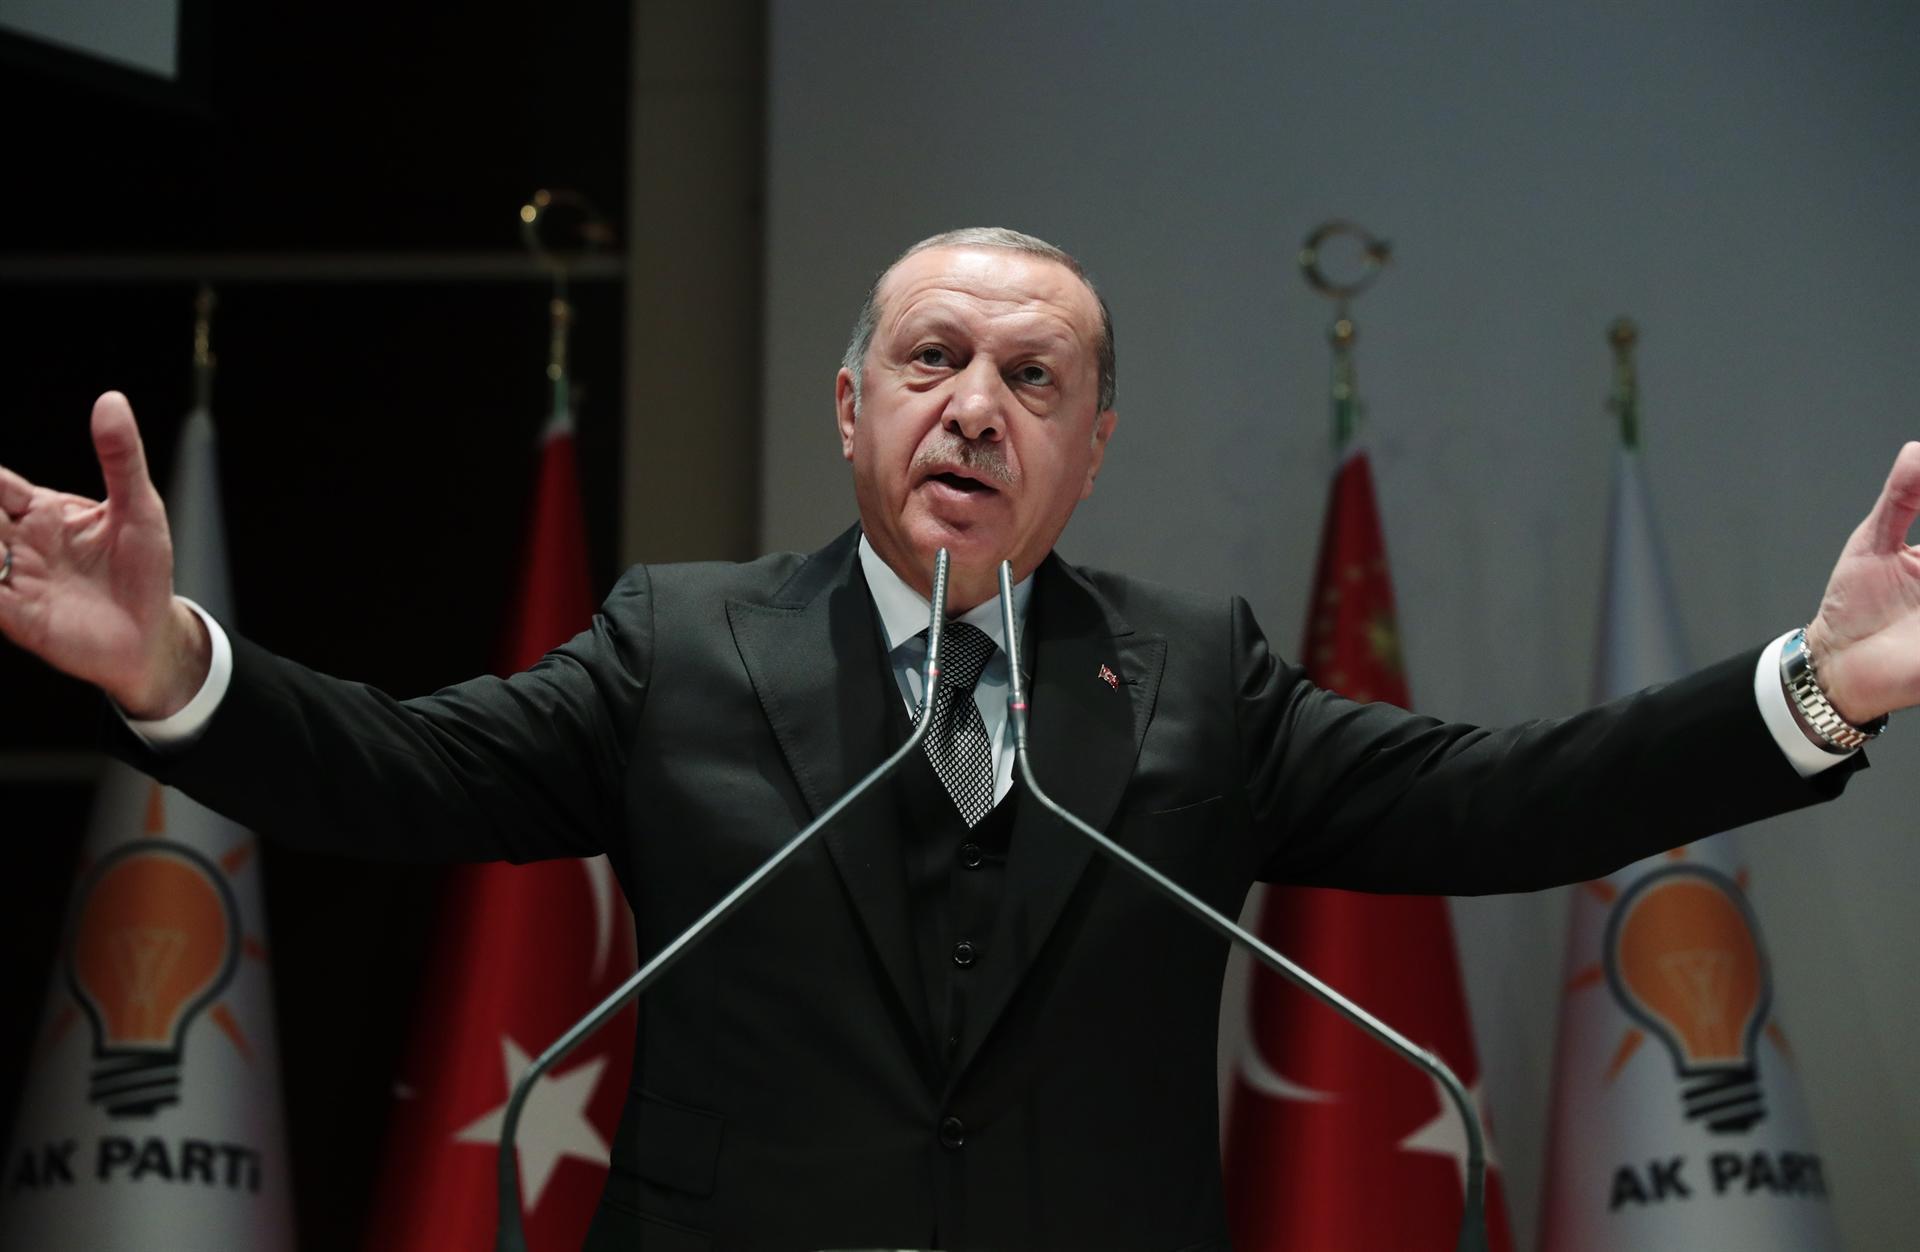 Erdogan calls for trial in Istanbul of Khashoggi suspects